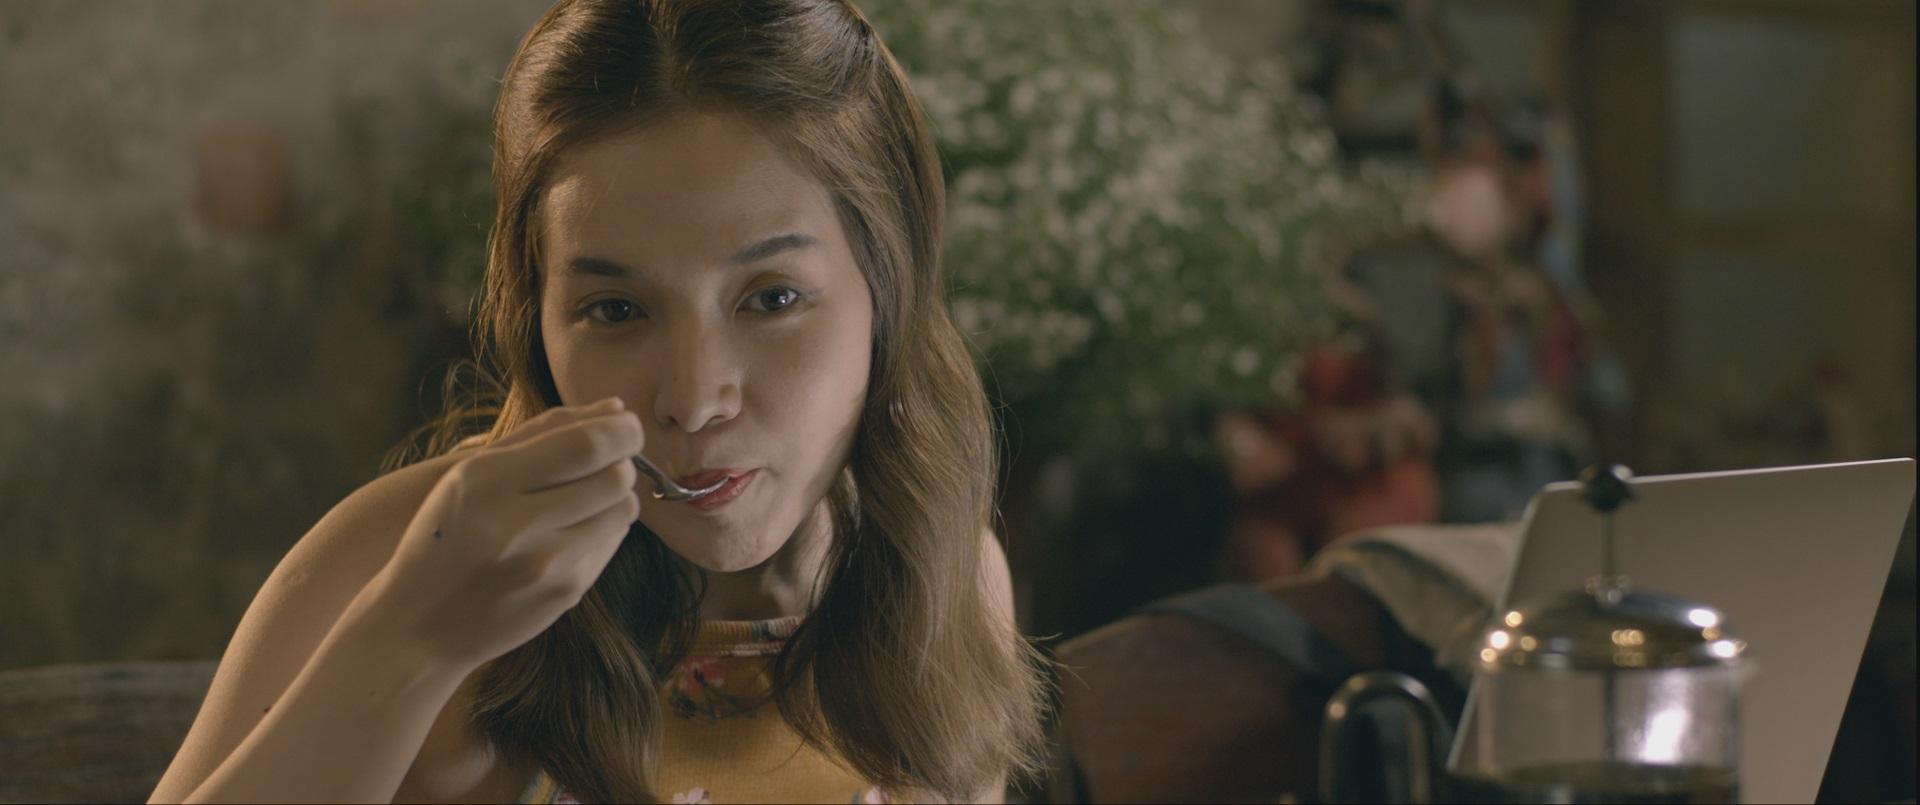 Kristel Fulgar plays a food vlogger